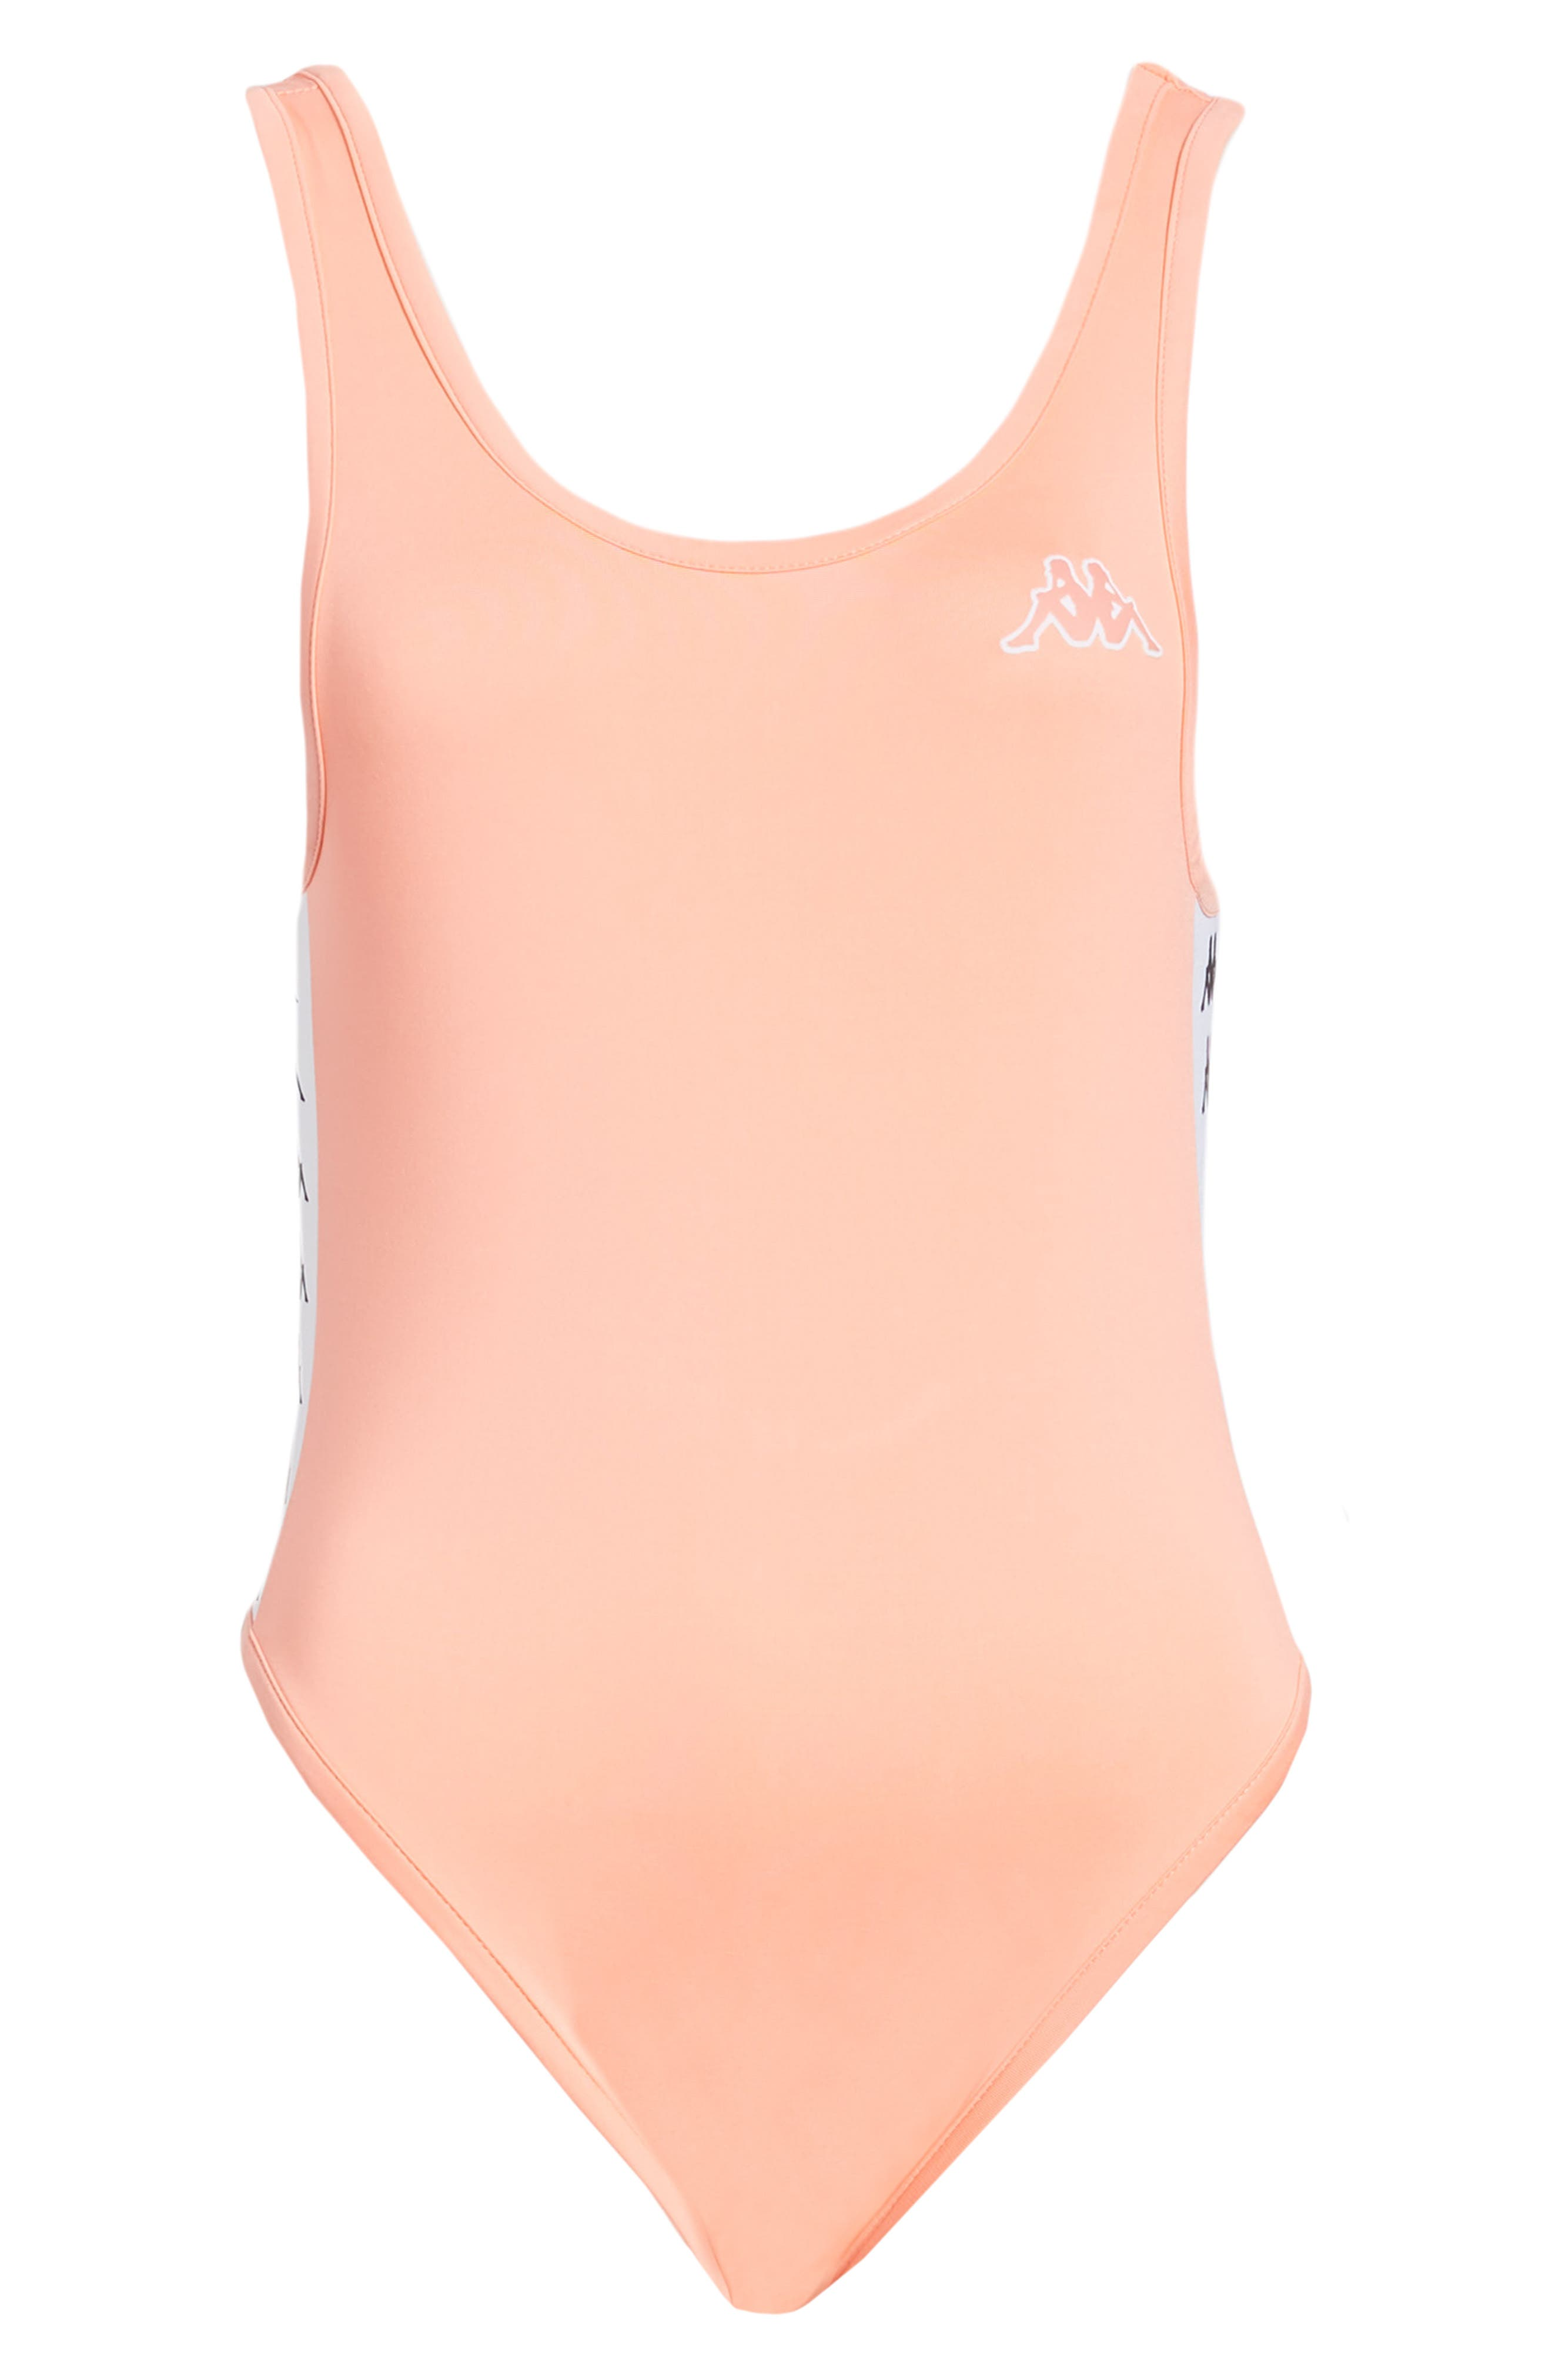 Banda Bodysuit,                             Alternate thumbnail 7, color,                             Pink Dk. Peach-White